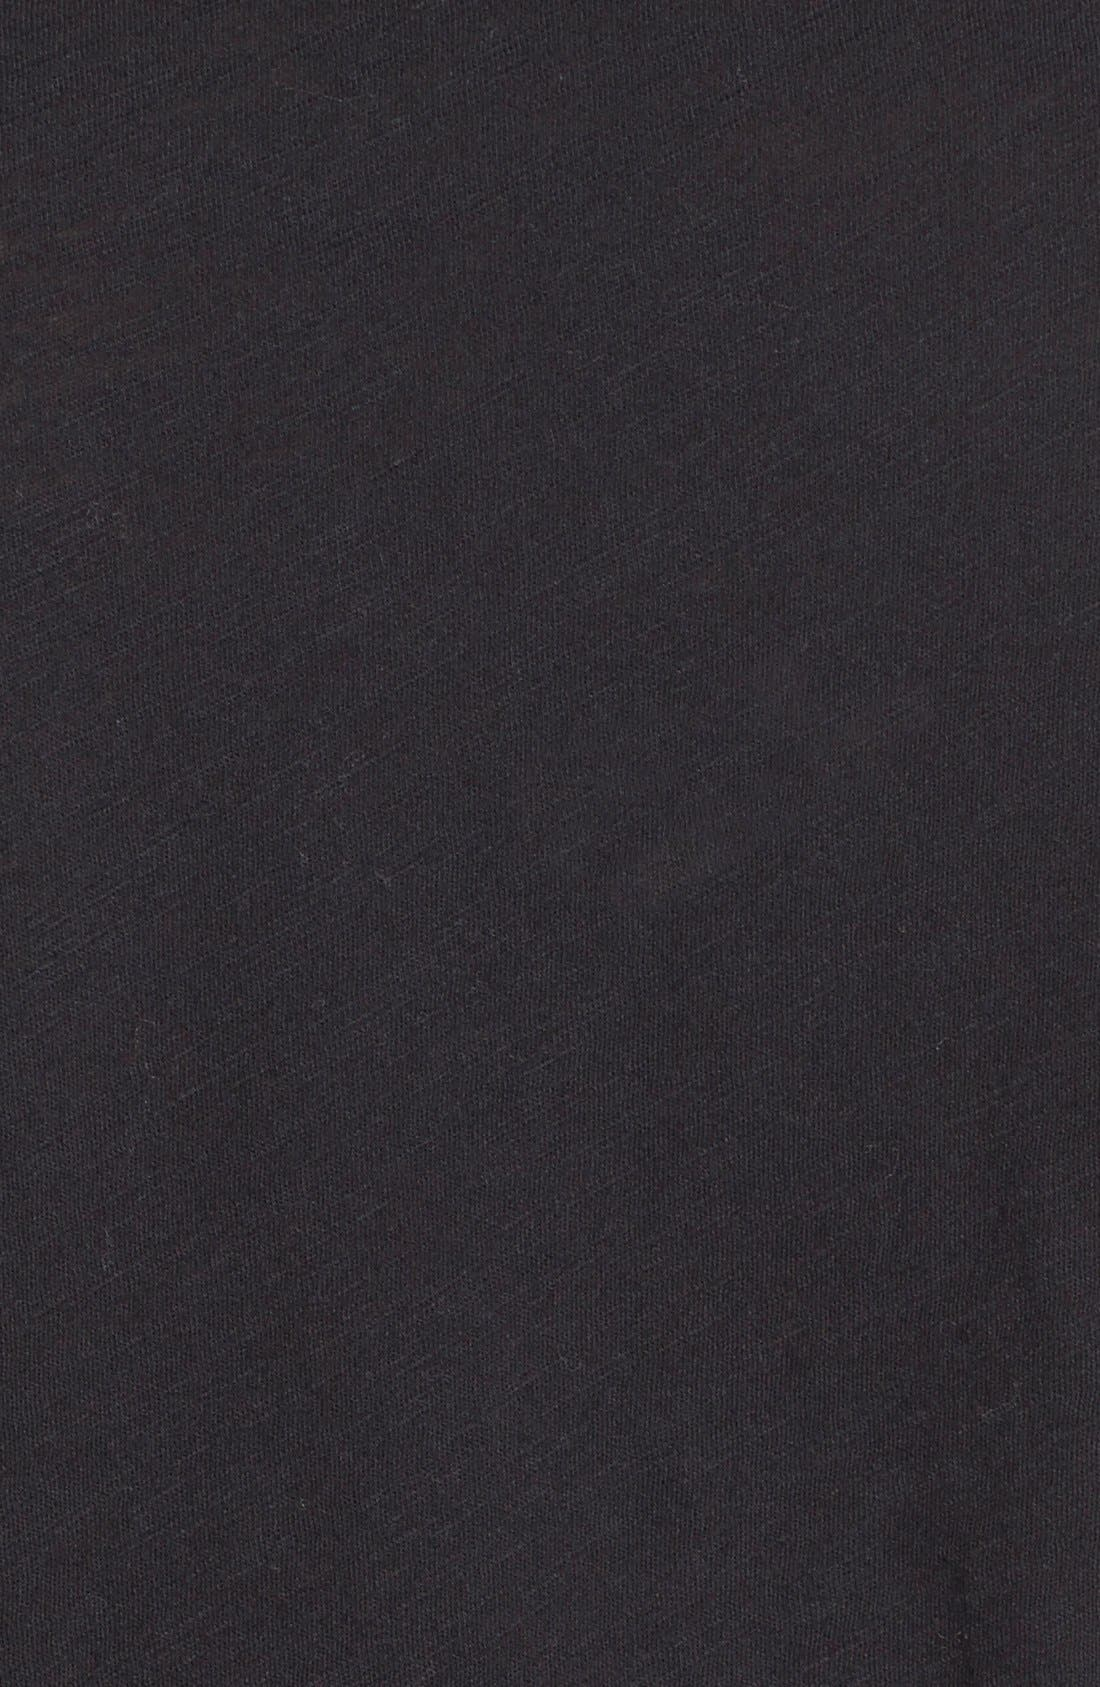 'Whisper' Cotton Crewneck Tee,                             Alternate thumbnail 7, color,                             001